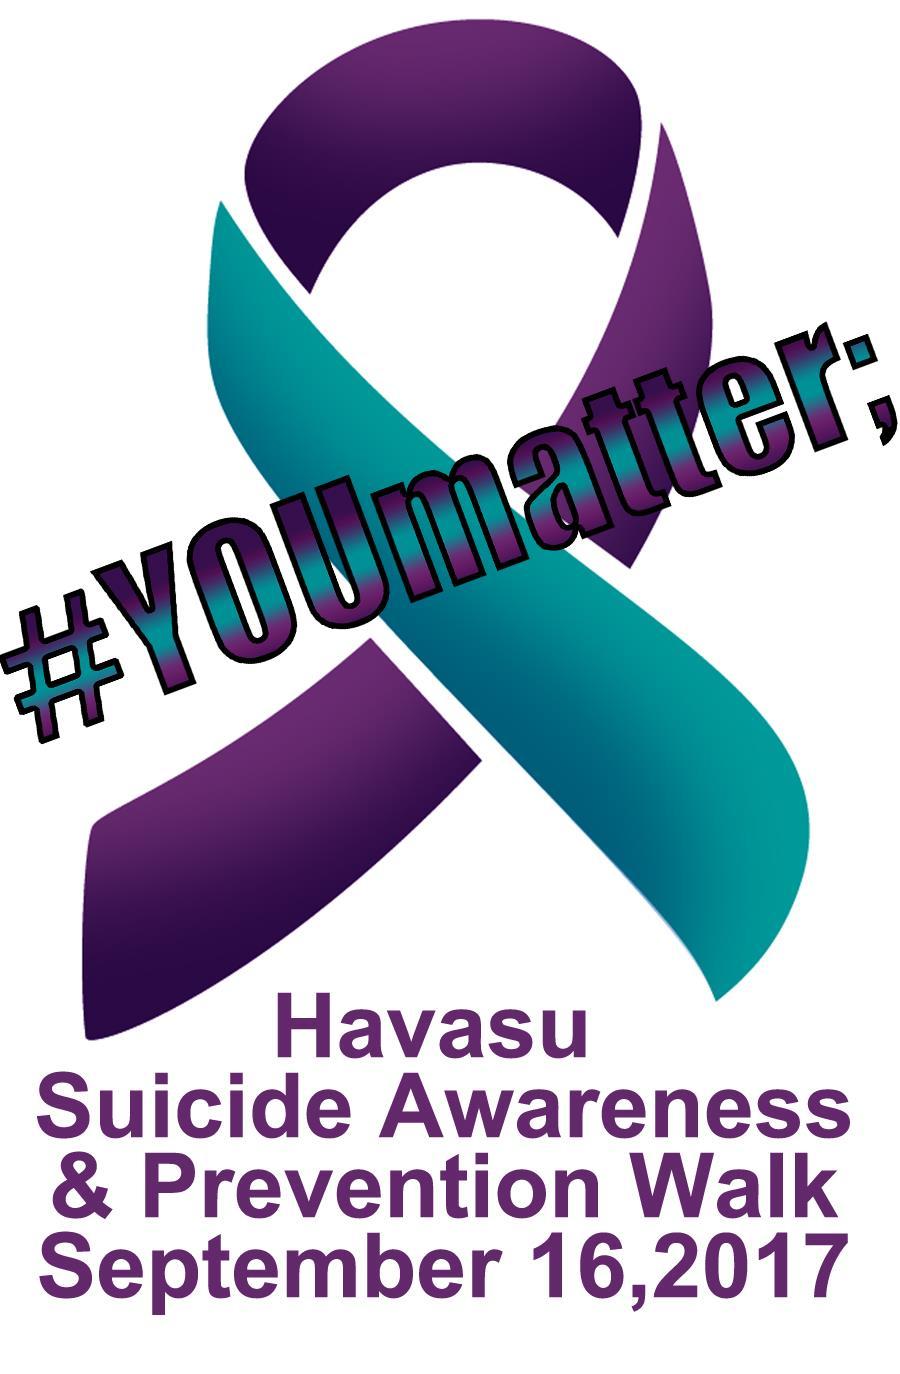 Havasu Suicide Awareness & Prevention Walk